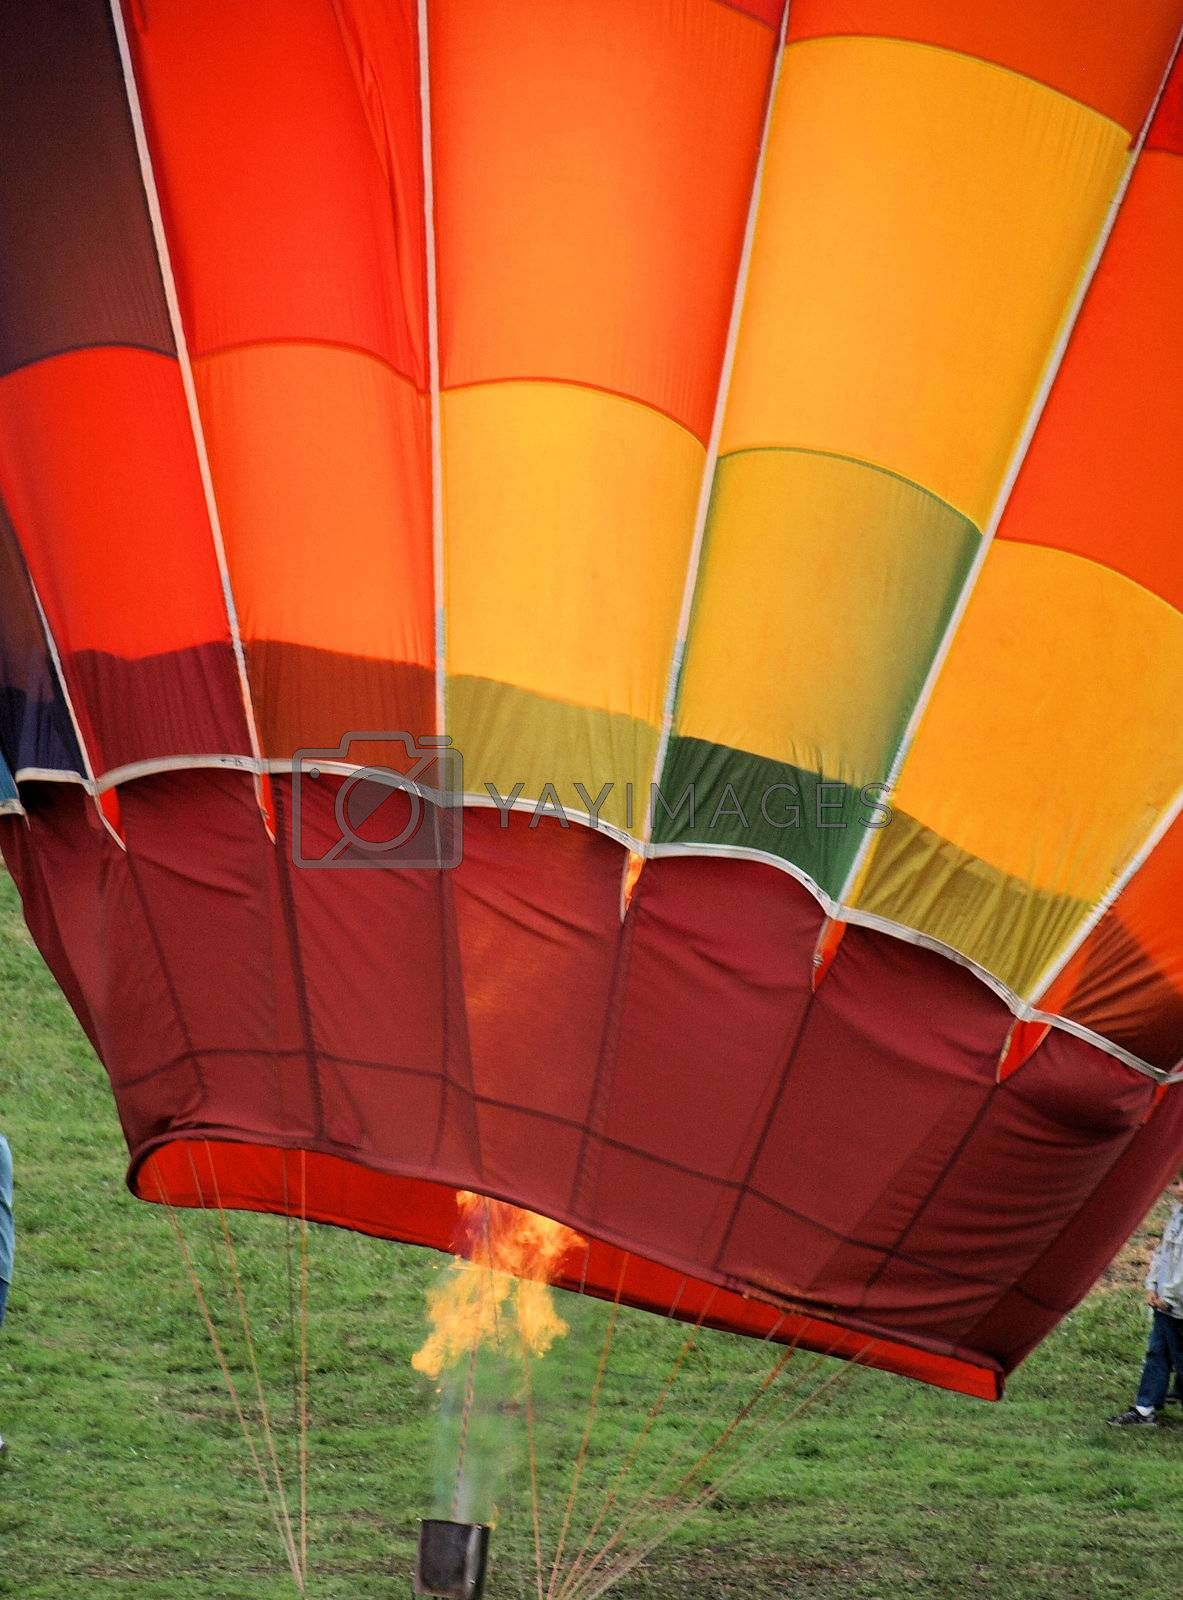 Hot air balloon festival in rural North Carolina.Heating up the balloon